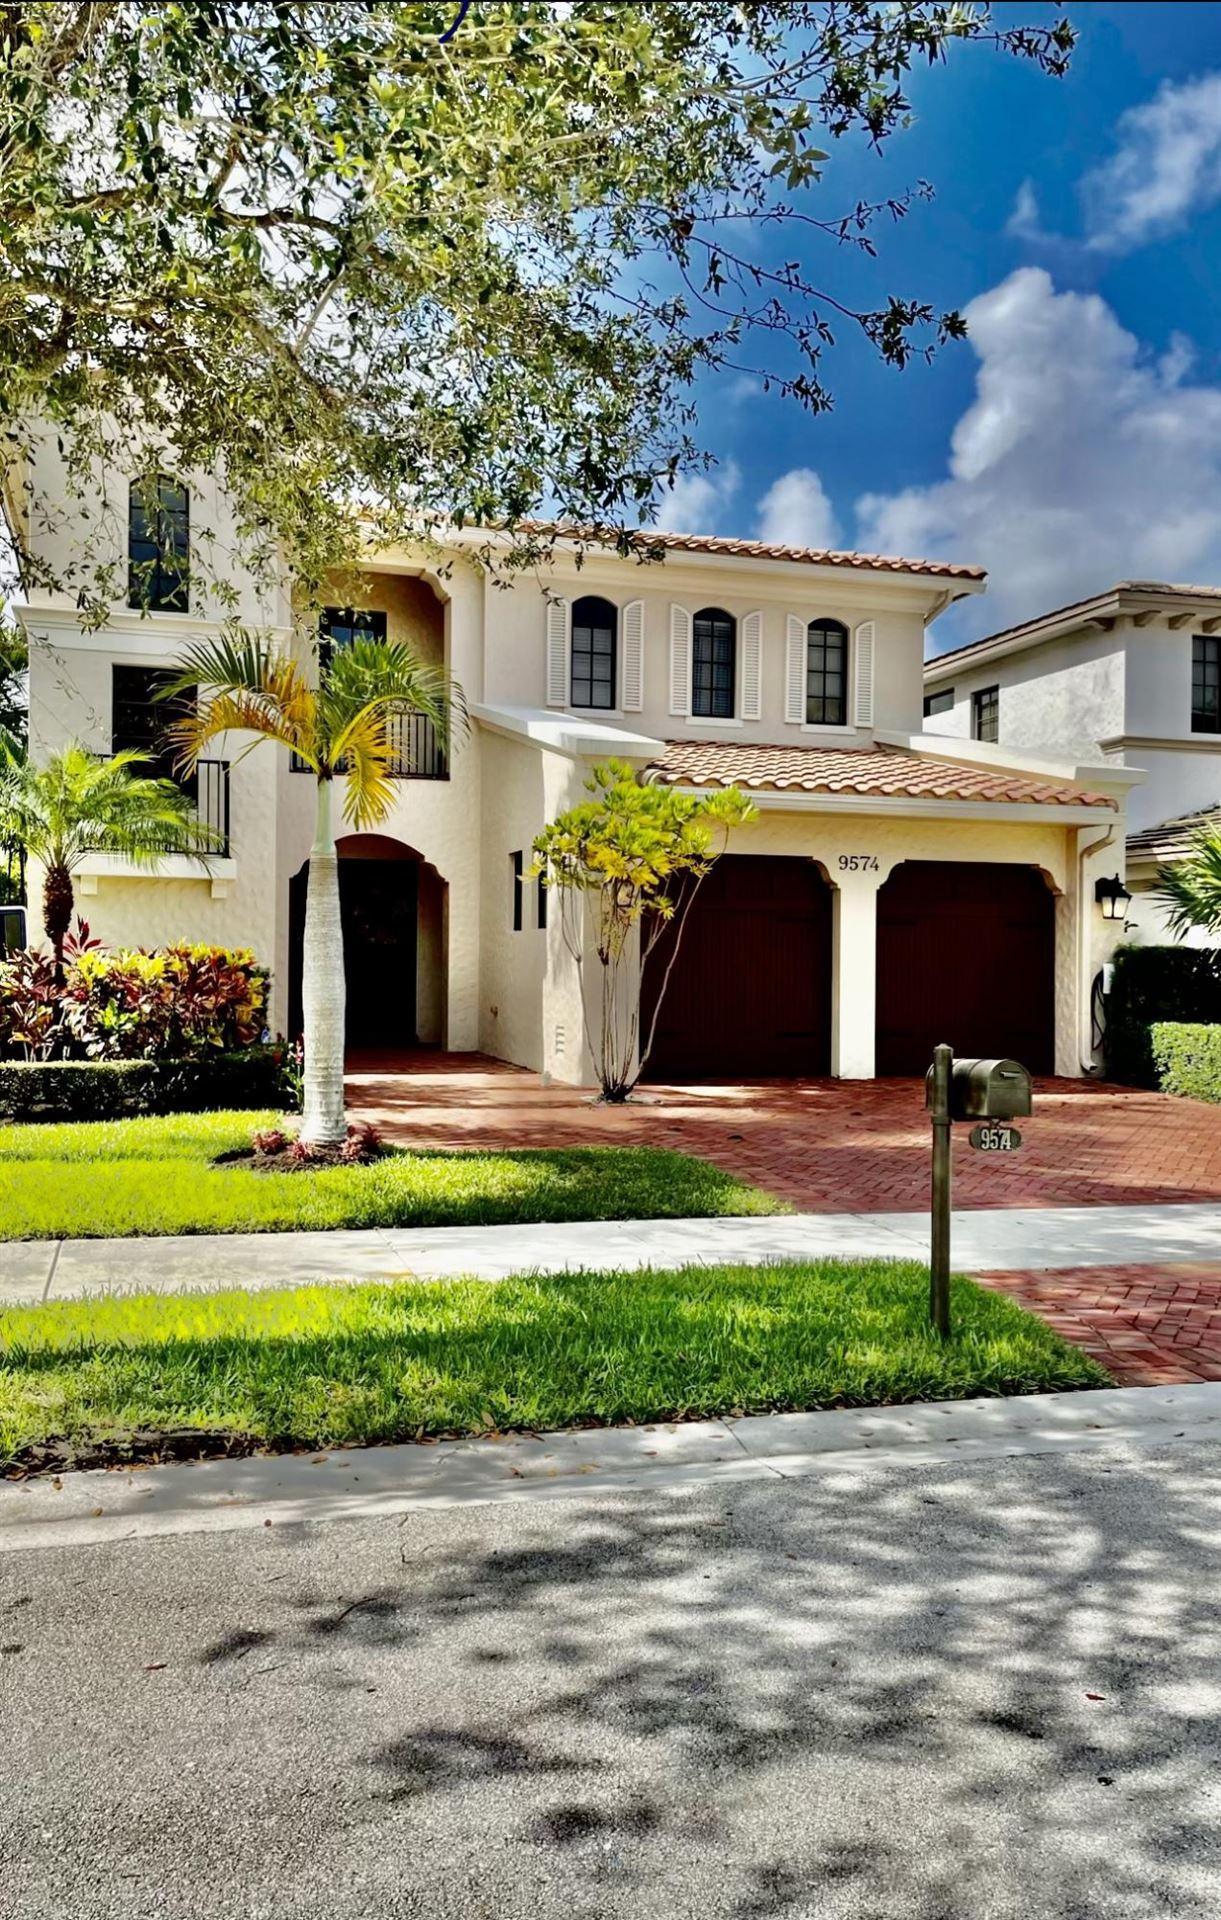 Photo for 9574 Exbury Court, Parkland, FL 33076 (MLS # RX-10739519)